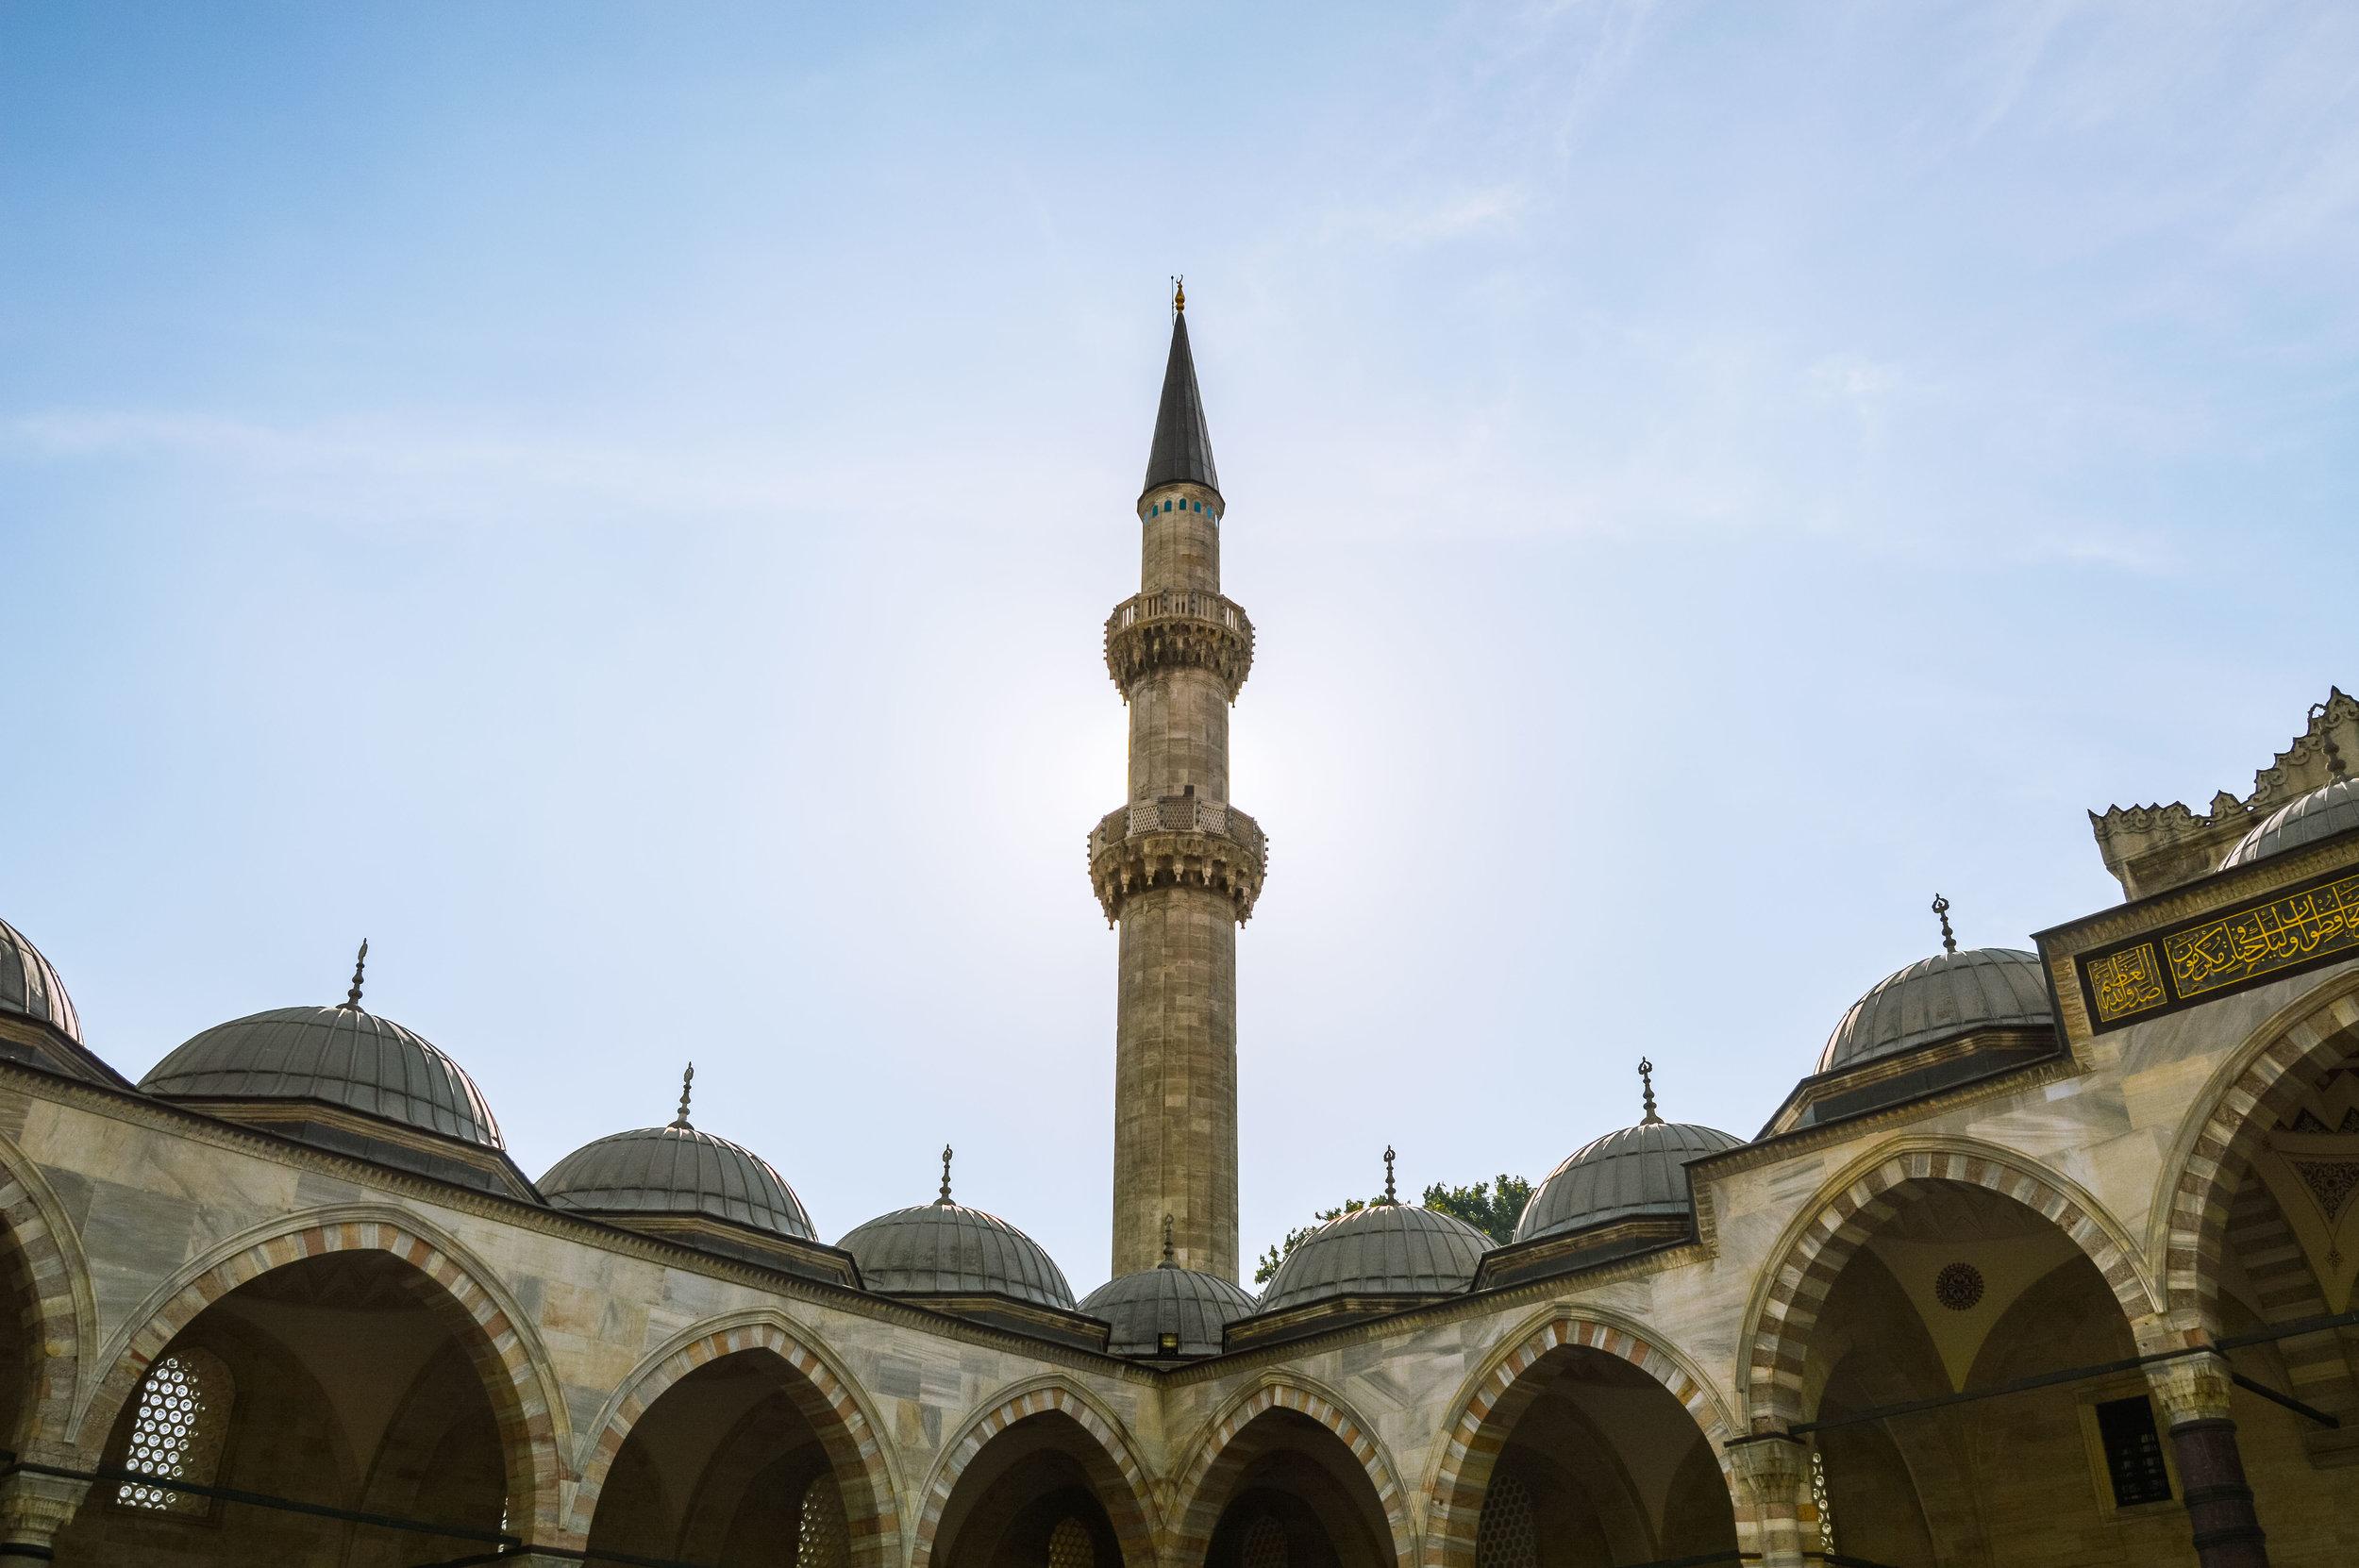 Süleymaniye Mosque Minaret Sunset Blue Sky Muslim Ottoman Empire Architecture Istanbul Turkey